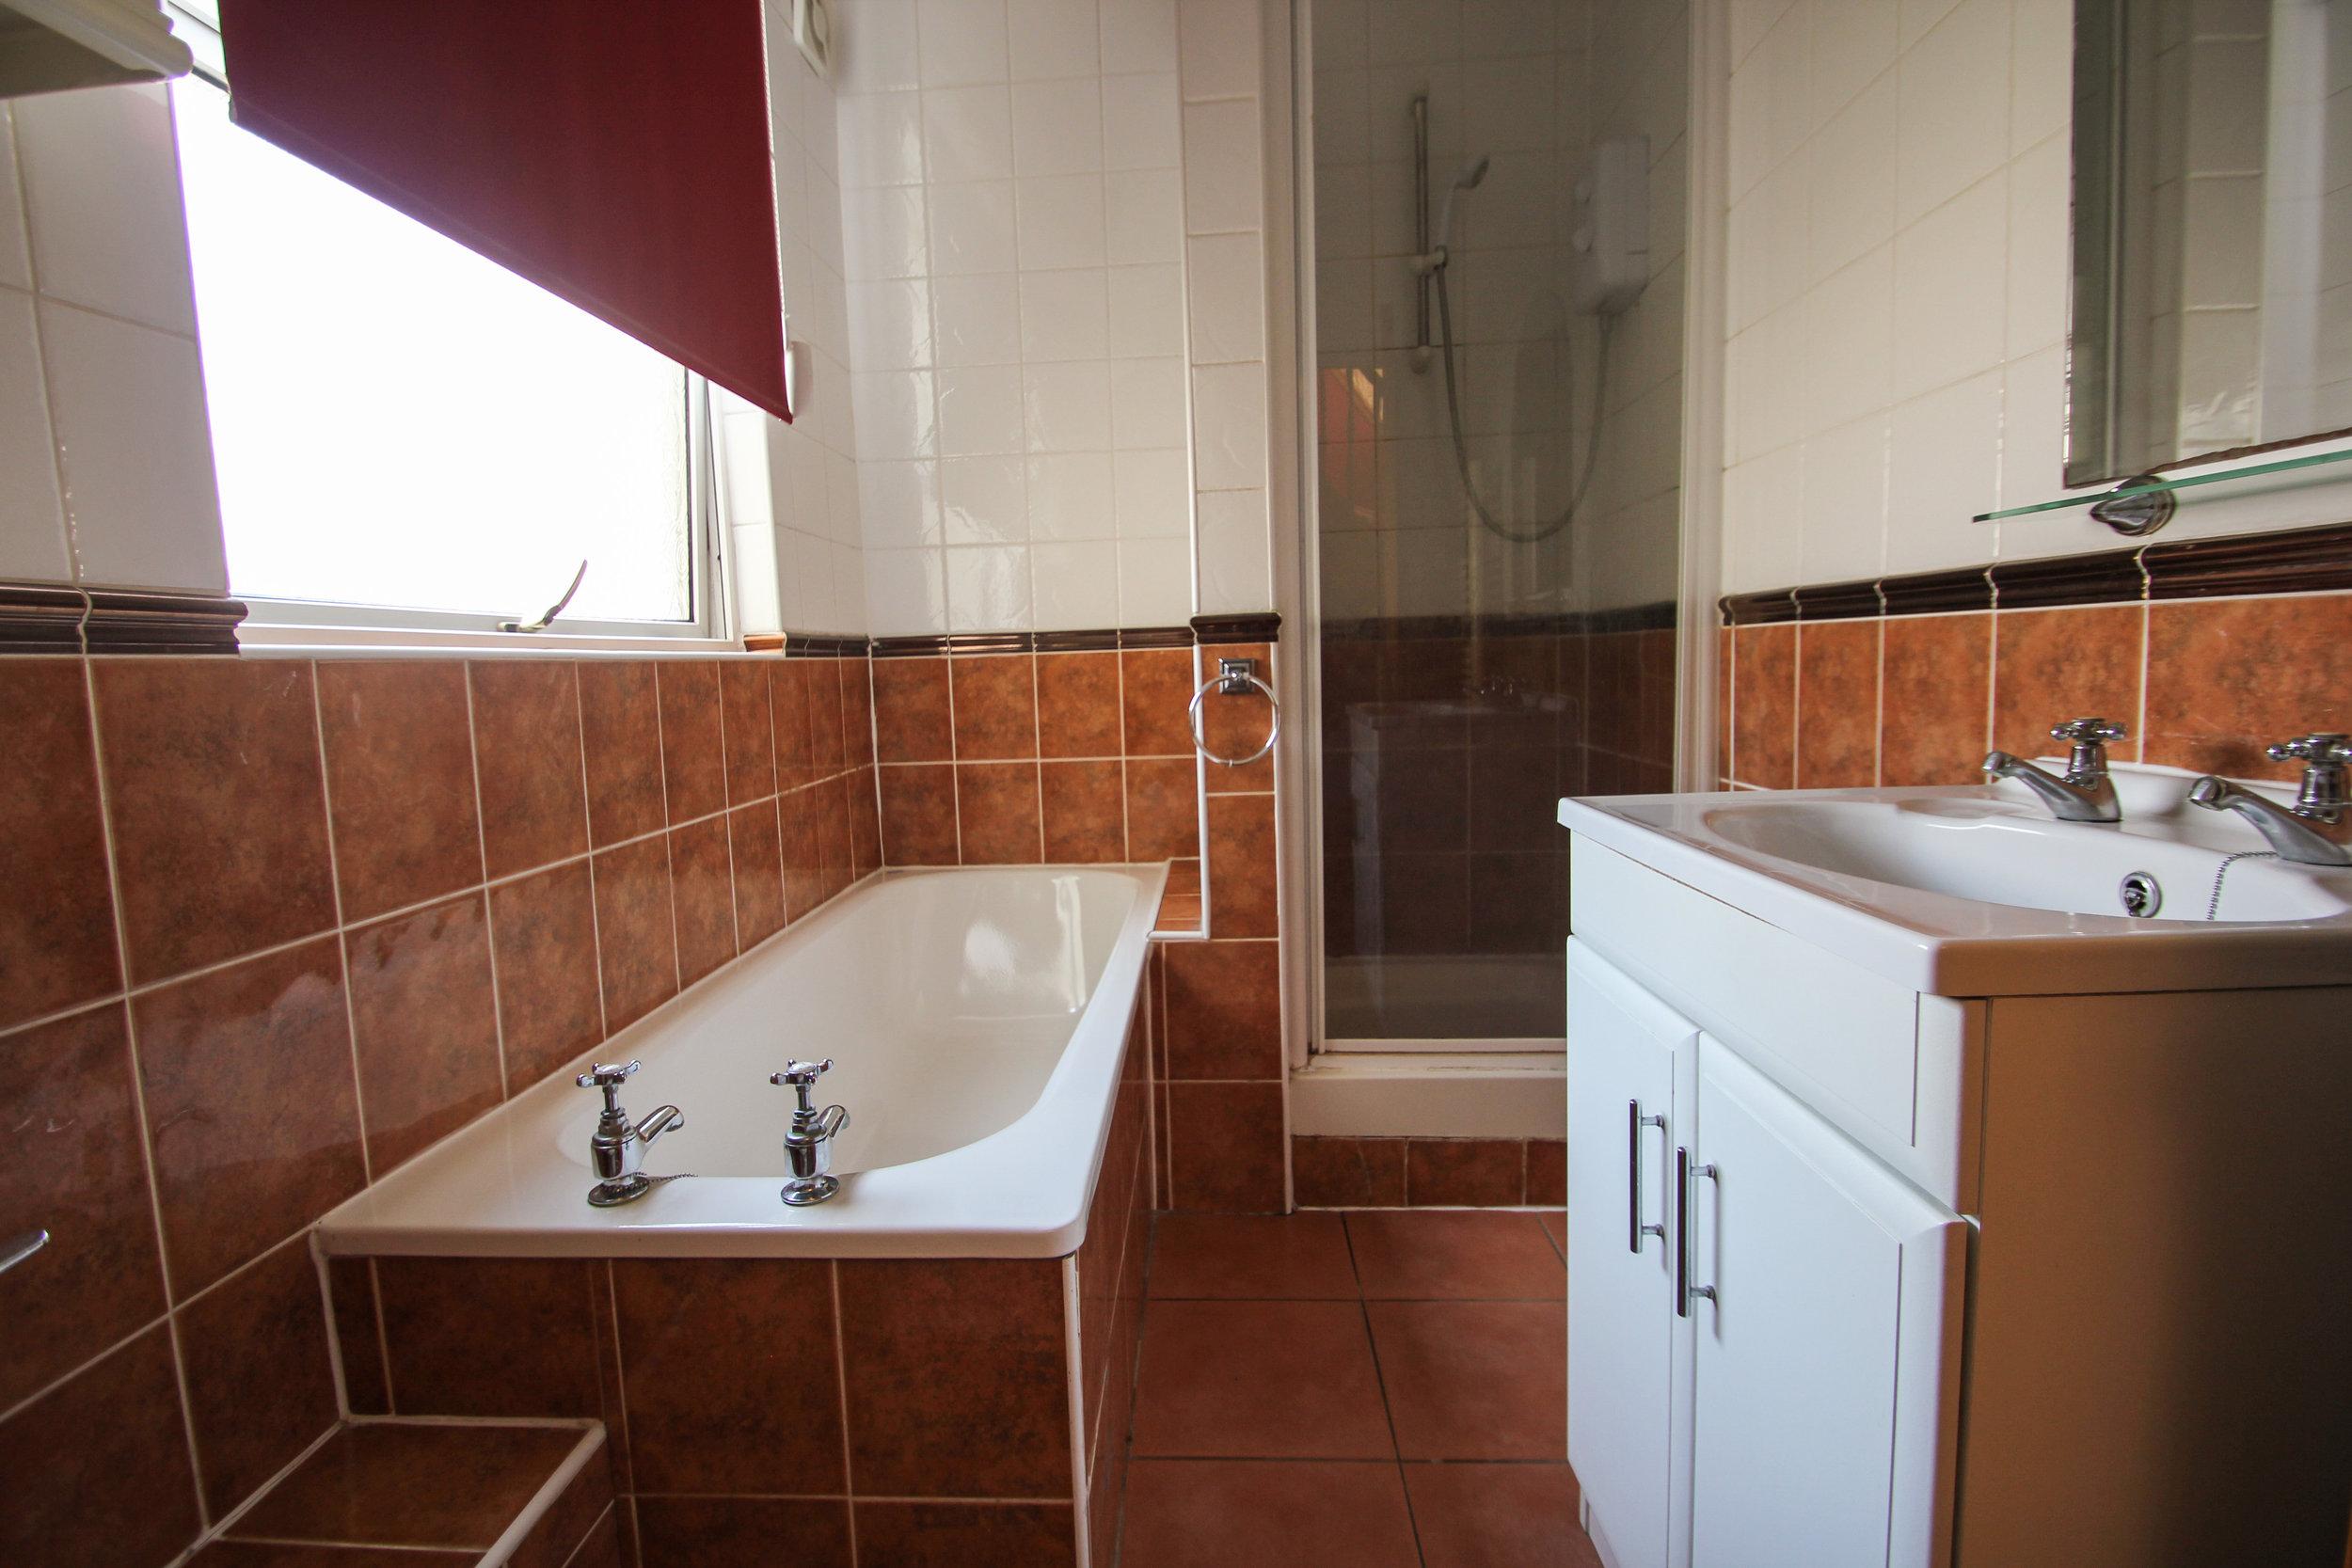 IMG_7731_edited.jpg bathroom.jpg